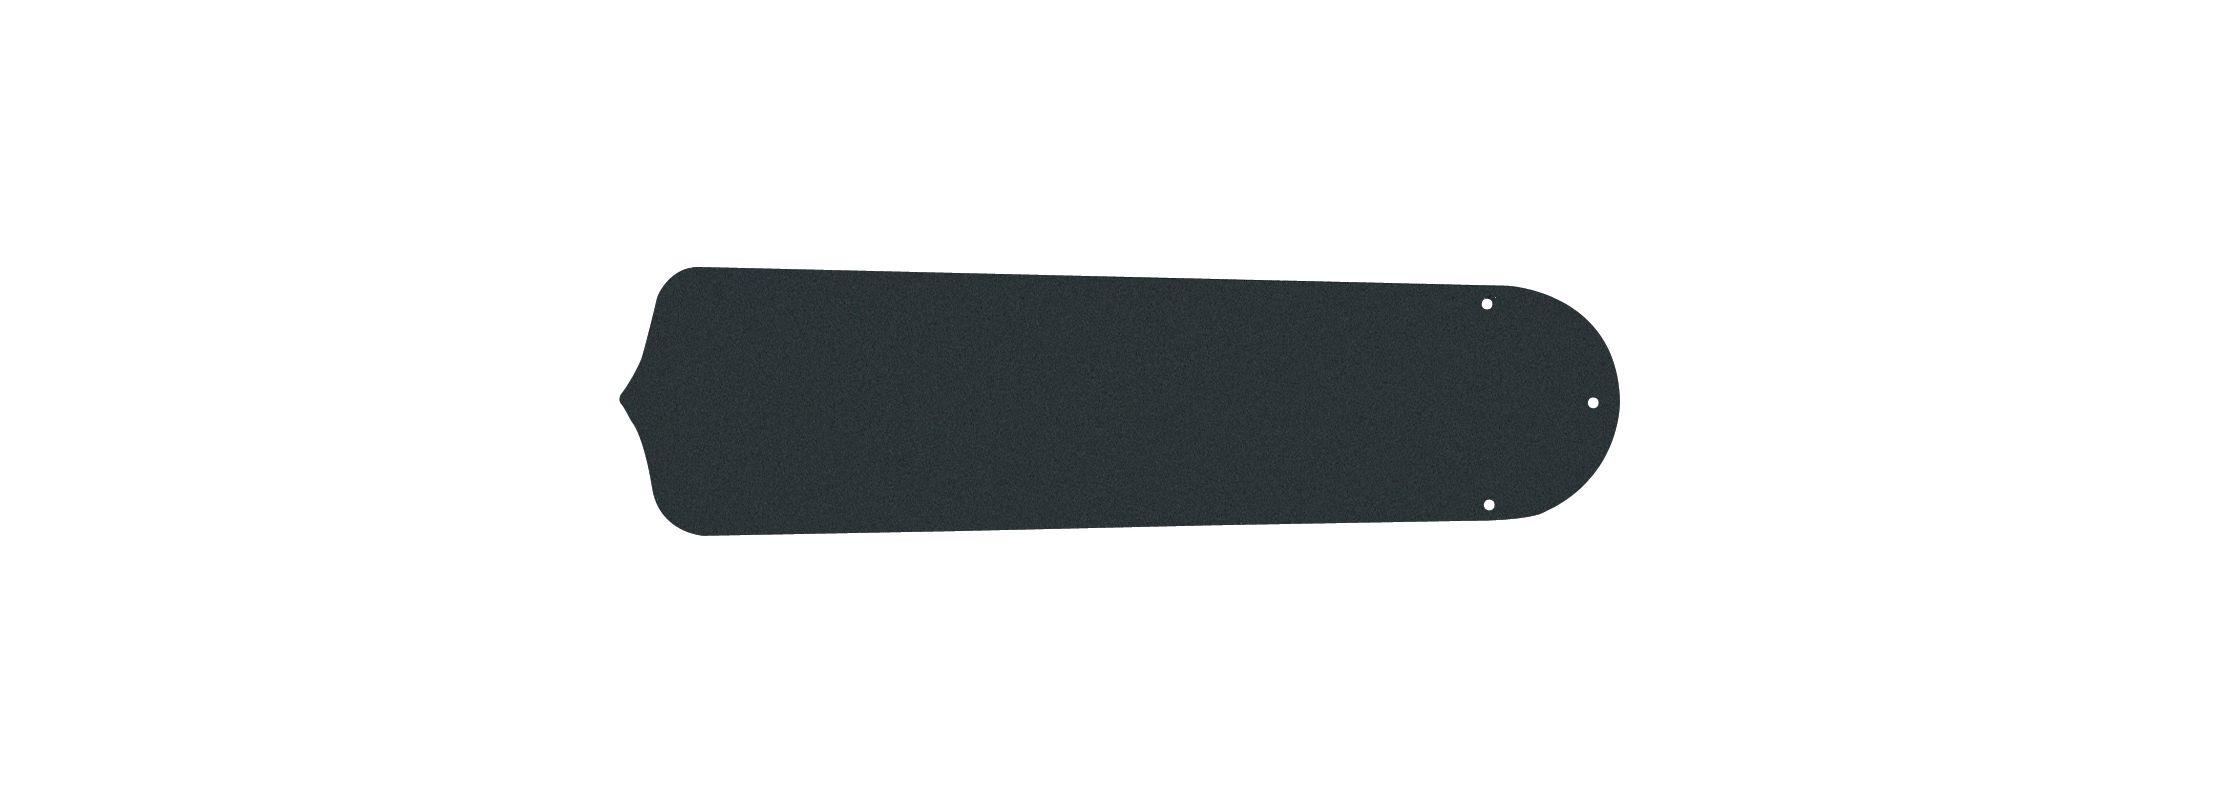 "Craftmade B552S-O 5 Blade Pack - 52"" Standard Blades Flat Black"